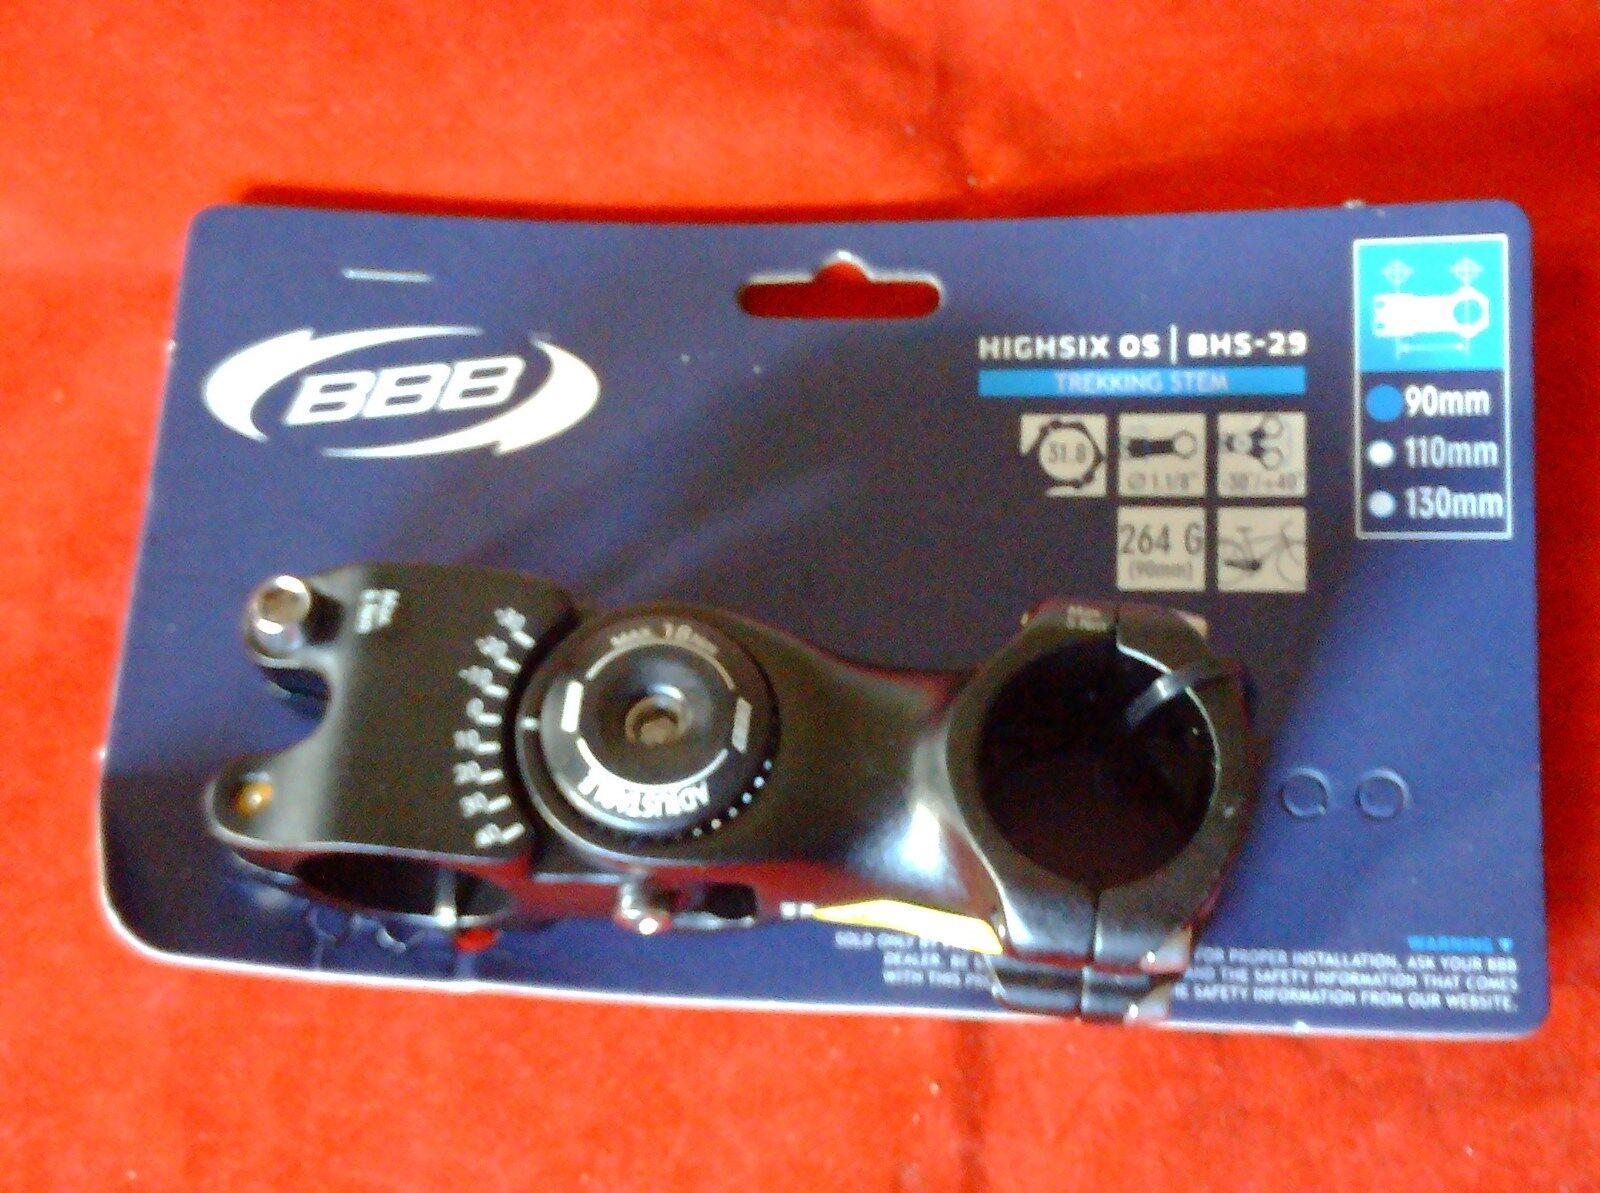 BBB HIGHSIX ADJUSTABLE   1 1 8  AHEAD STEM 90mm, 31.8mm BARS  more discount